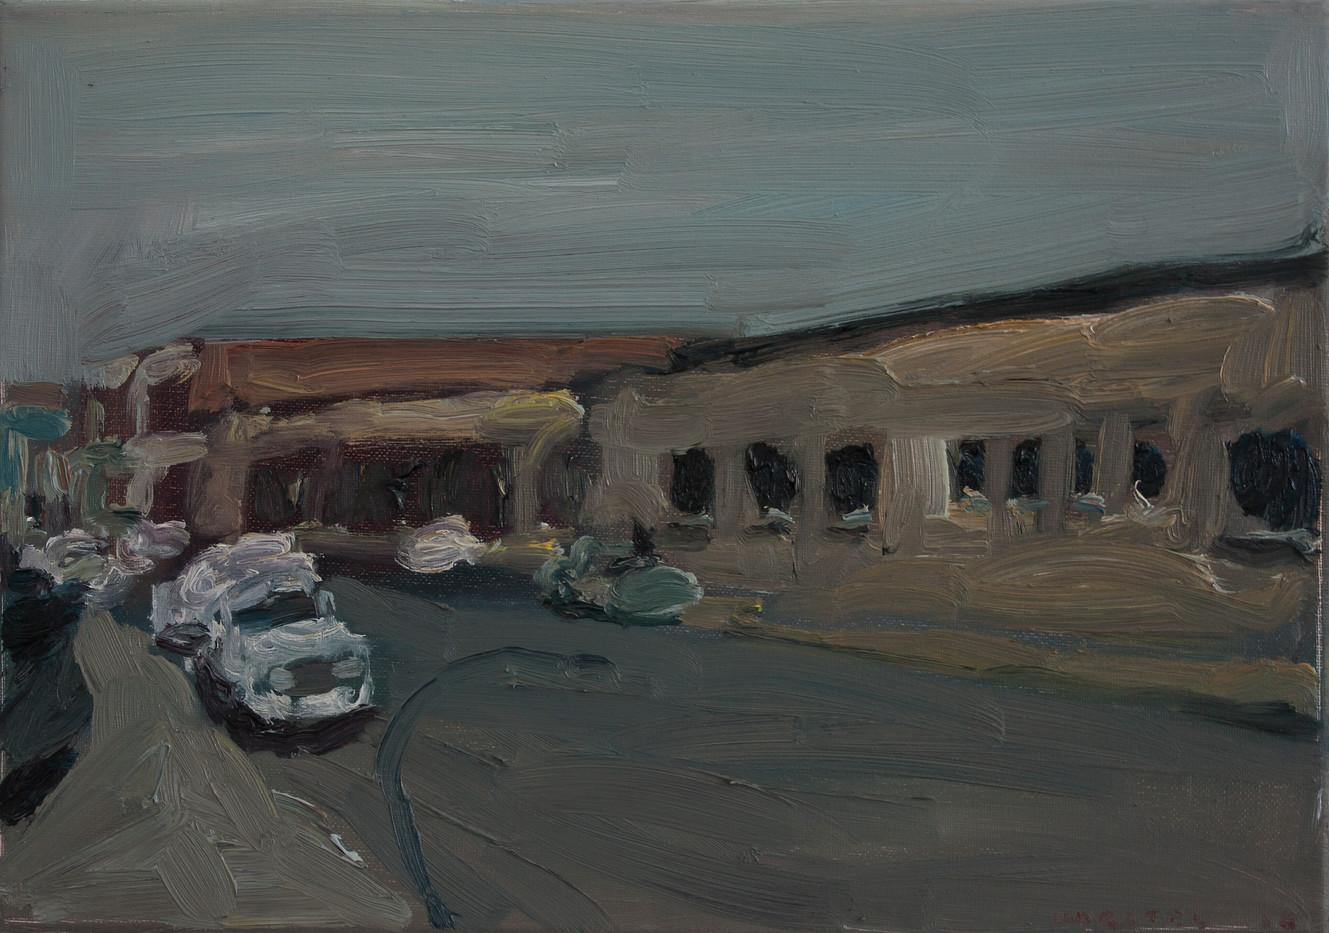 Anton Karstel | Property (Village Main) | 2014 | Oil on Canvas | 29.5 x 42.5 cm